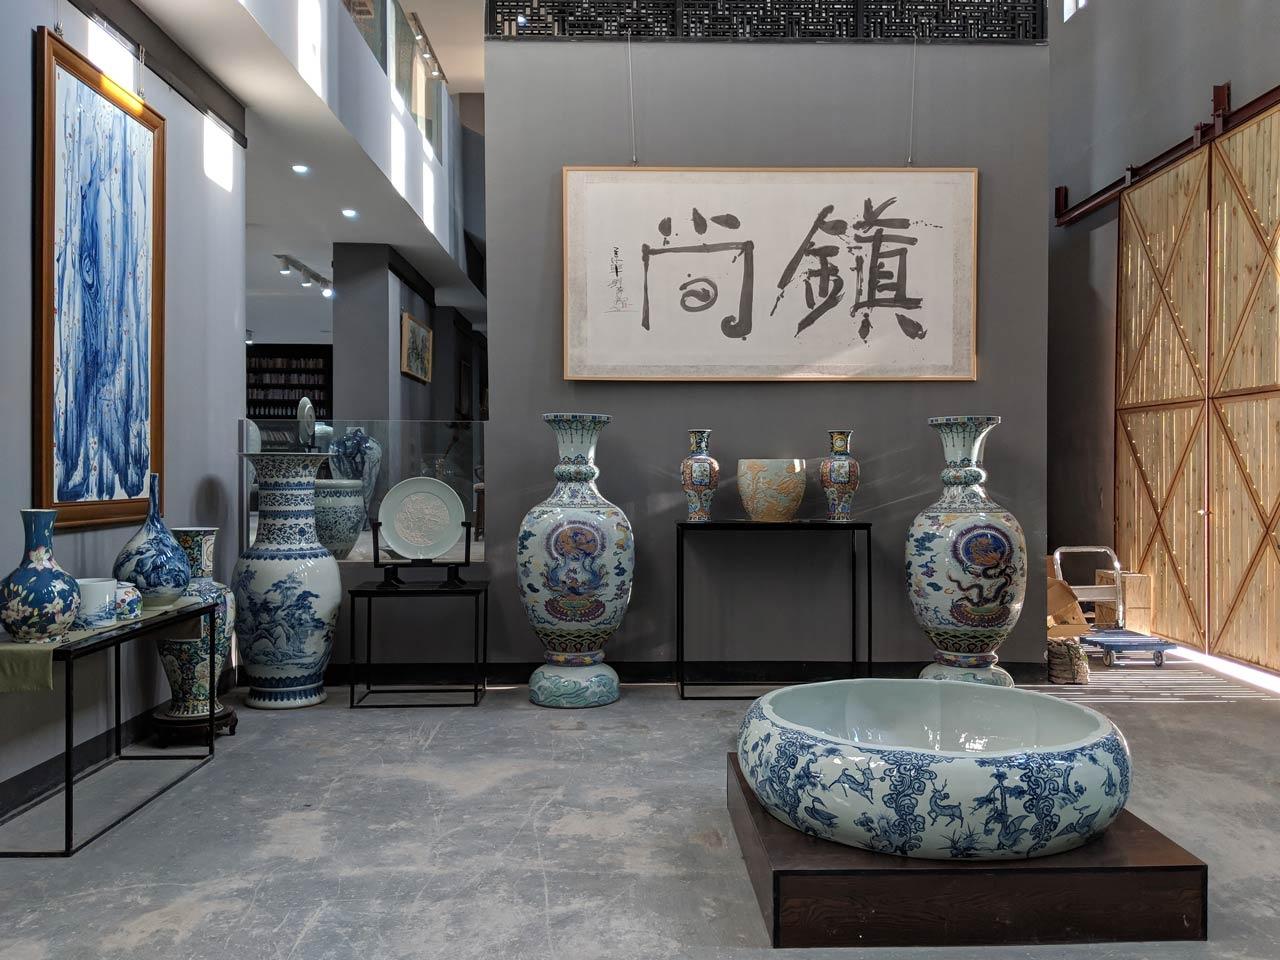 The Porcelain Tour of China | China Design Centre